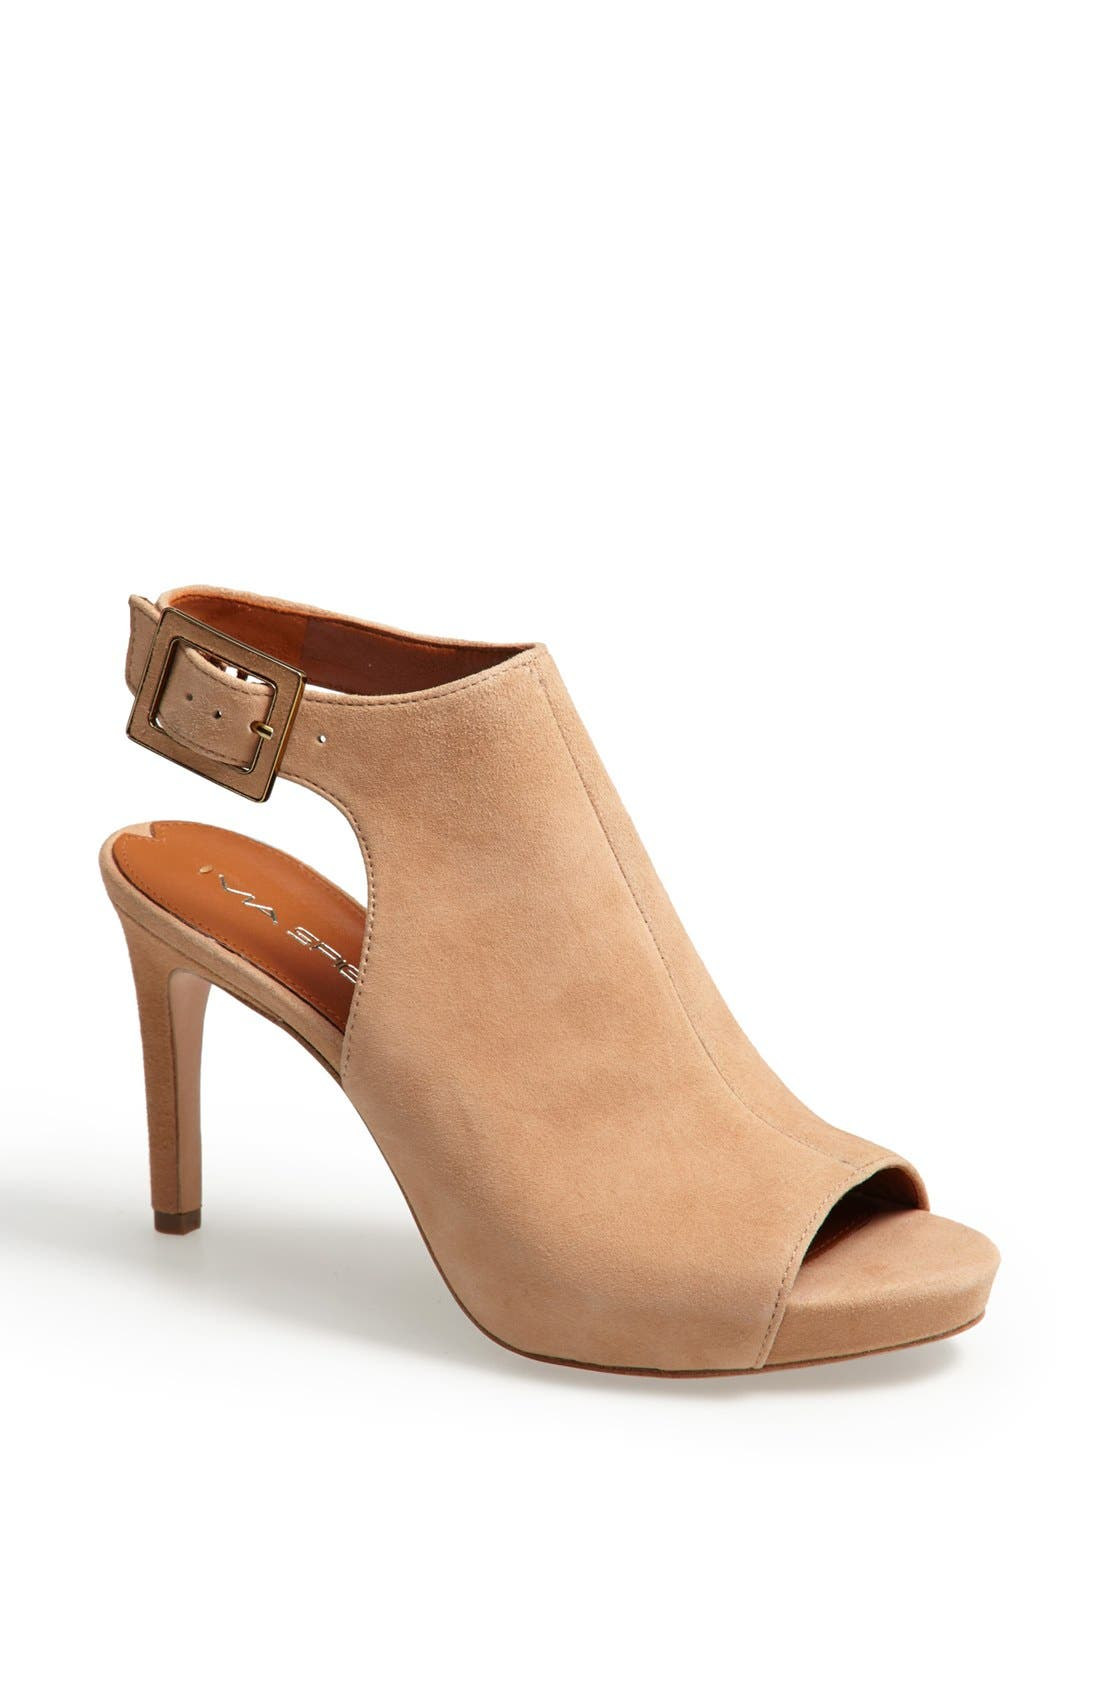 'Nino' Ankle Strap Sandal,                             Main thumbnail 1, color,                             Desert Suede